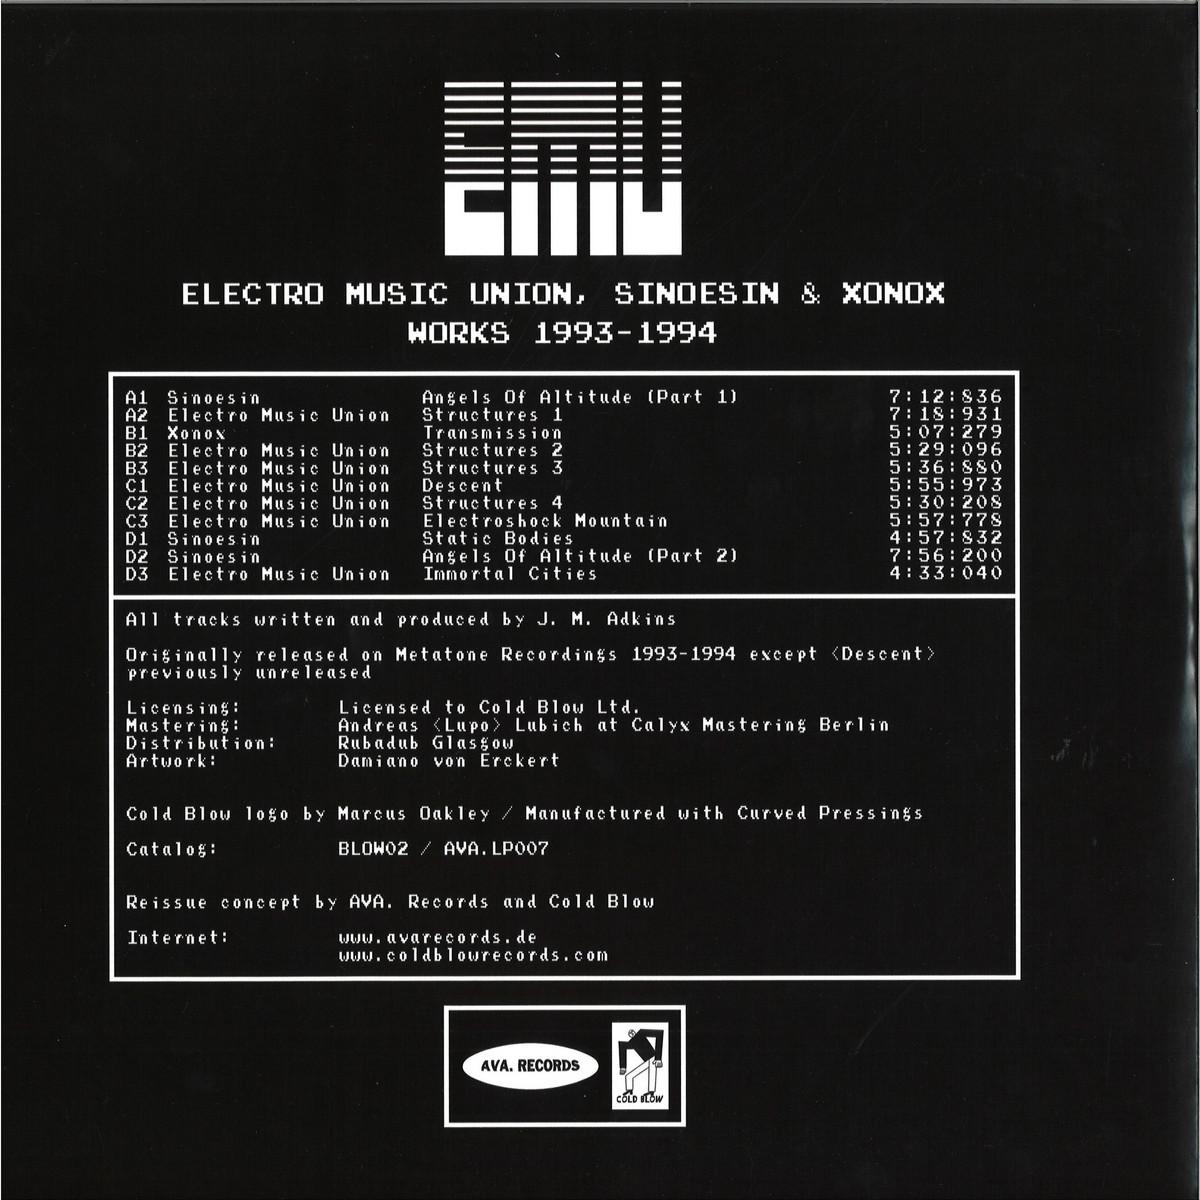 E M U  - Electro Music Union, Sinoesin & Xonox Works 1993 - 1994